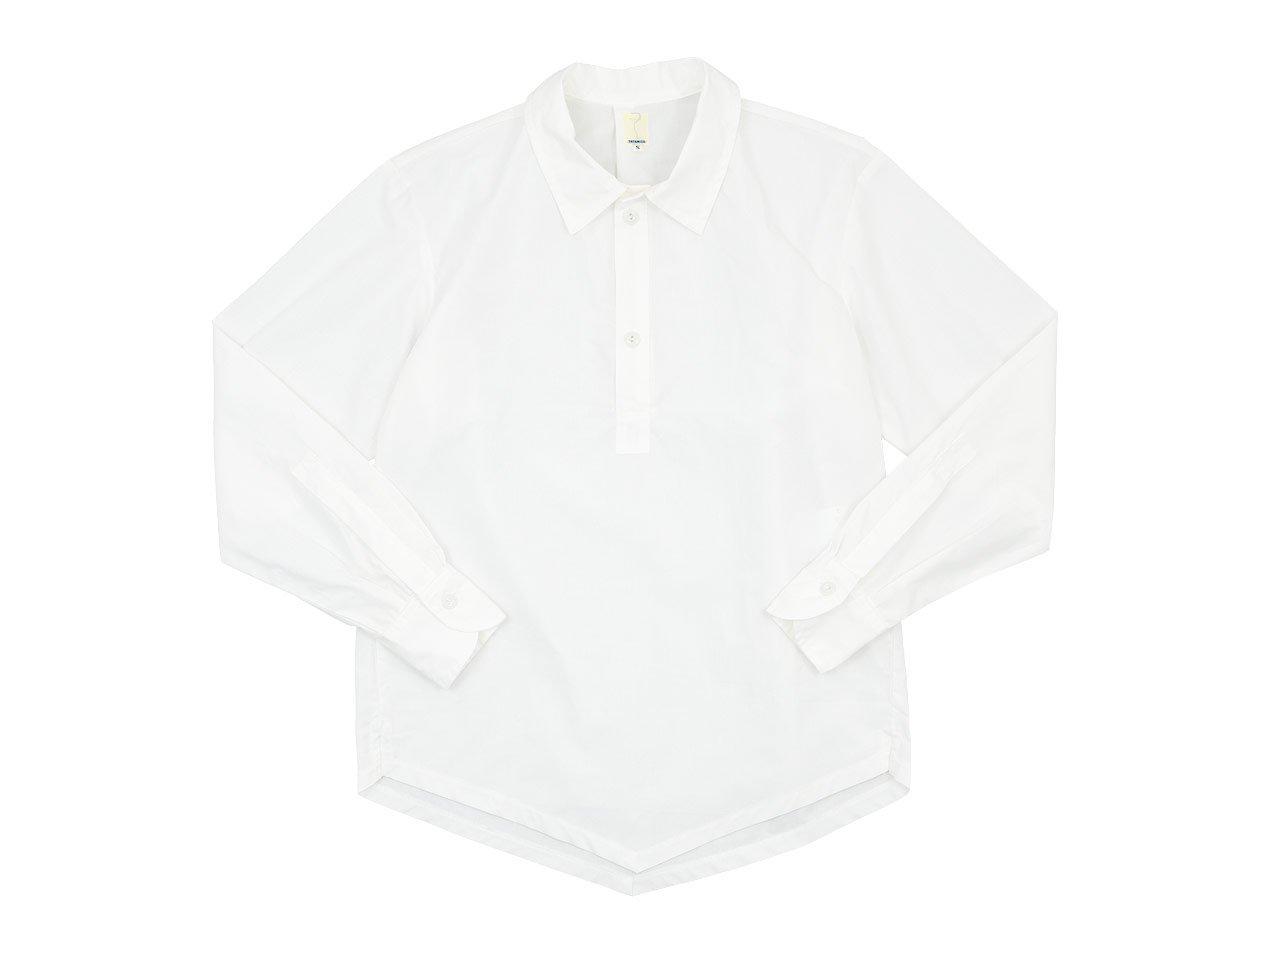 TATAMIZE P/O WORK SHIRTS WHITE